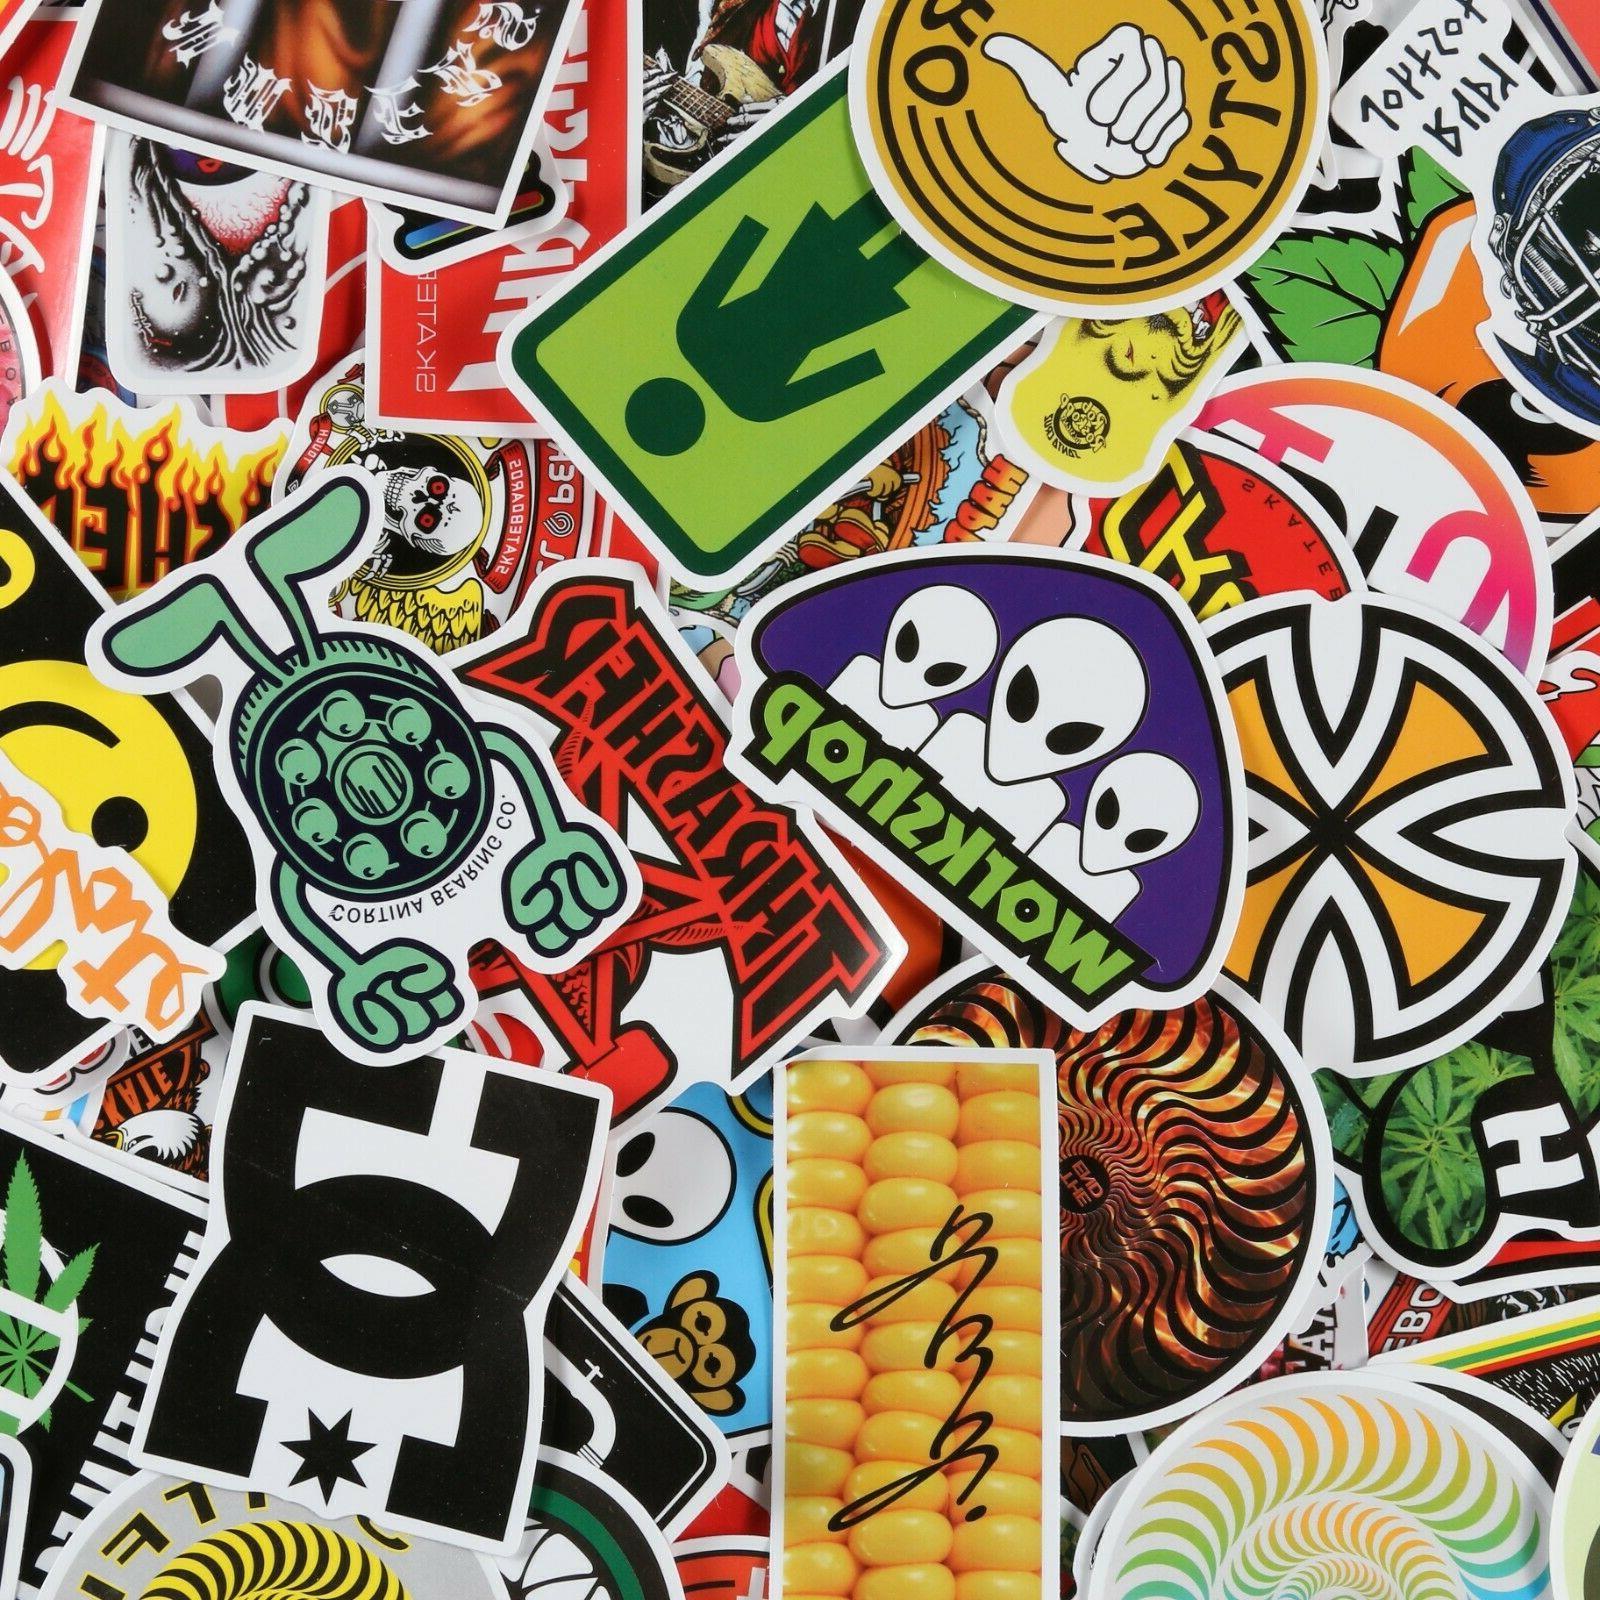 100pcs skateboard stickers bomb skate brand stickers